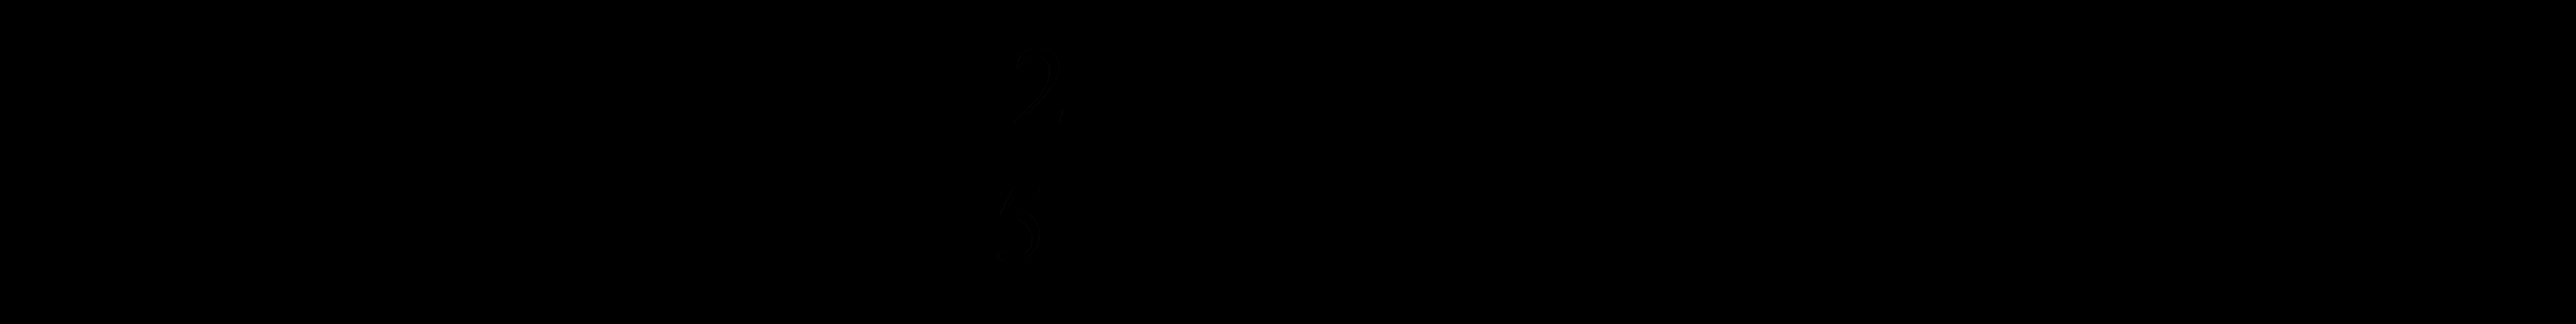 img30